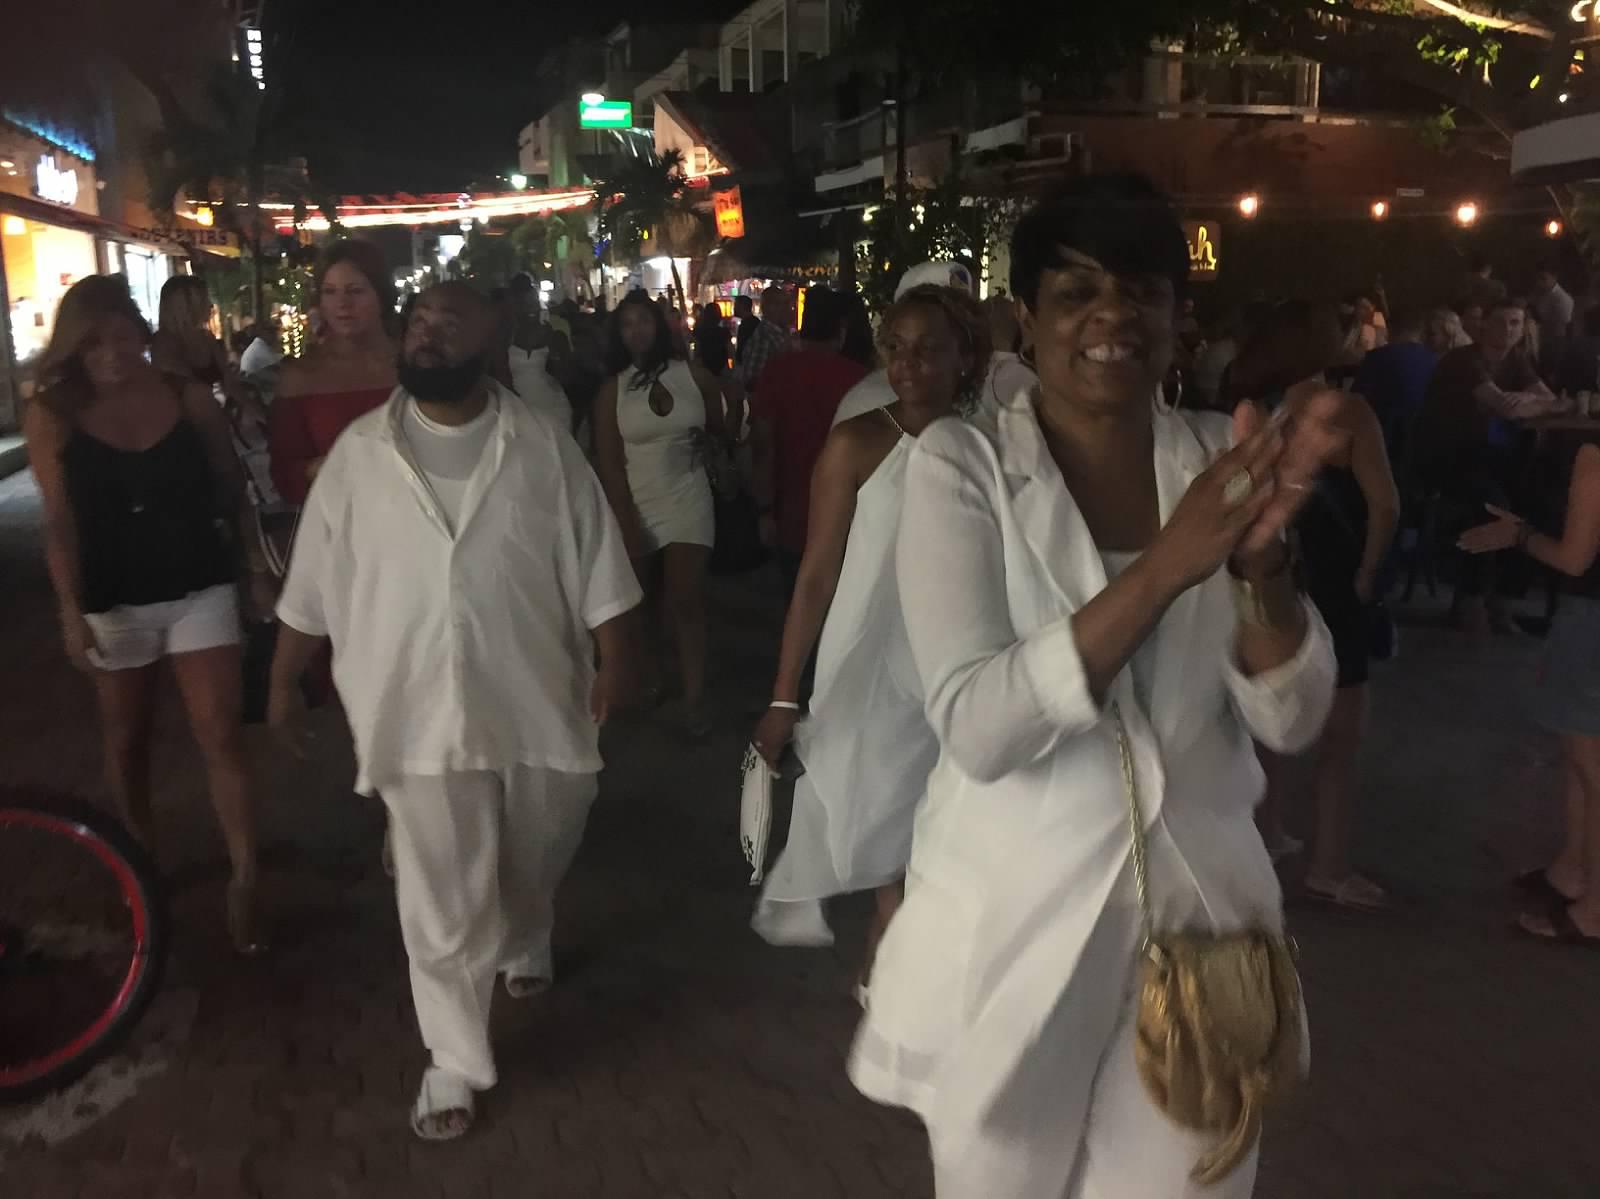 Black Destination Bride - BlackDesti Wedding Countdown Journal - Bridefriends Podcast - 1 Playa del Carmen Mexico - Carboncitos Rooftop Downtown Party.jpeg